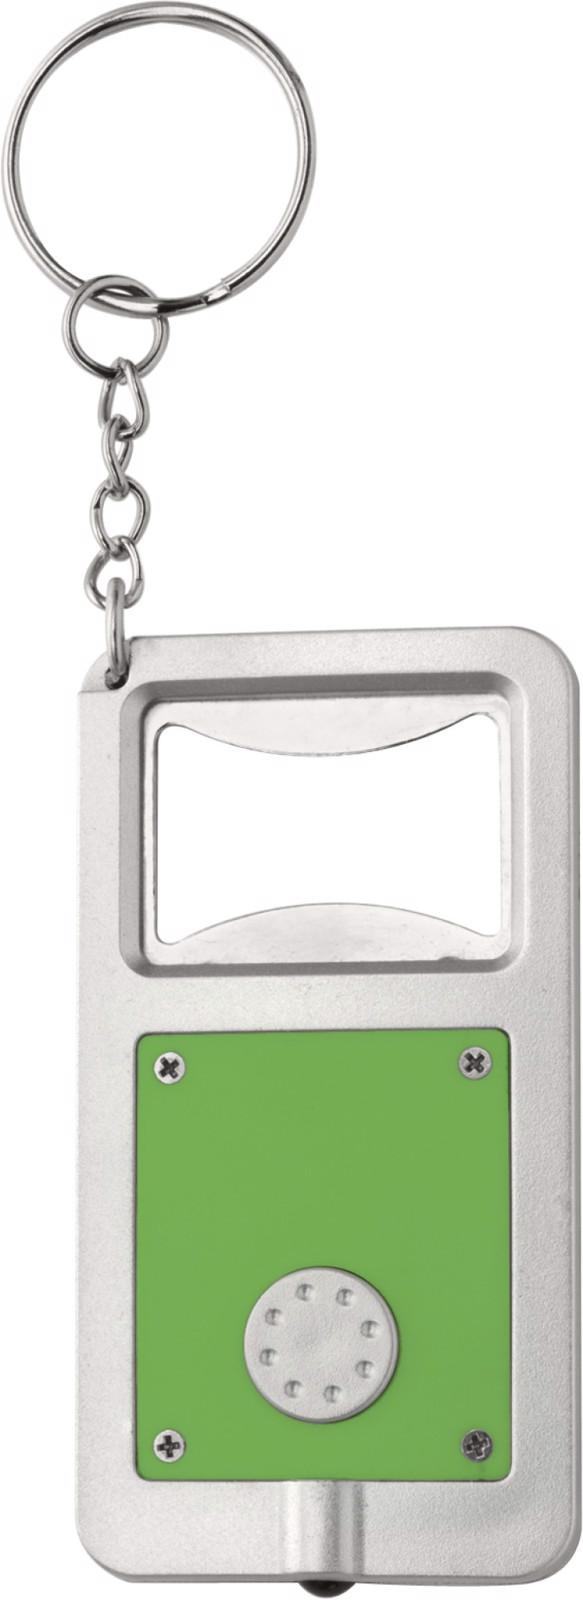 Plastic key holder with LED - Light Green